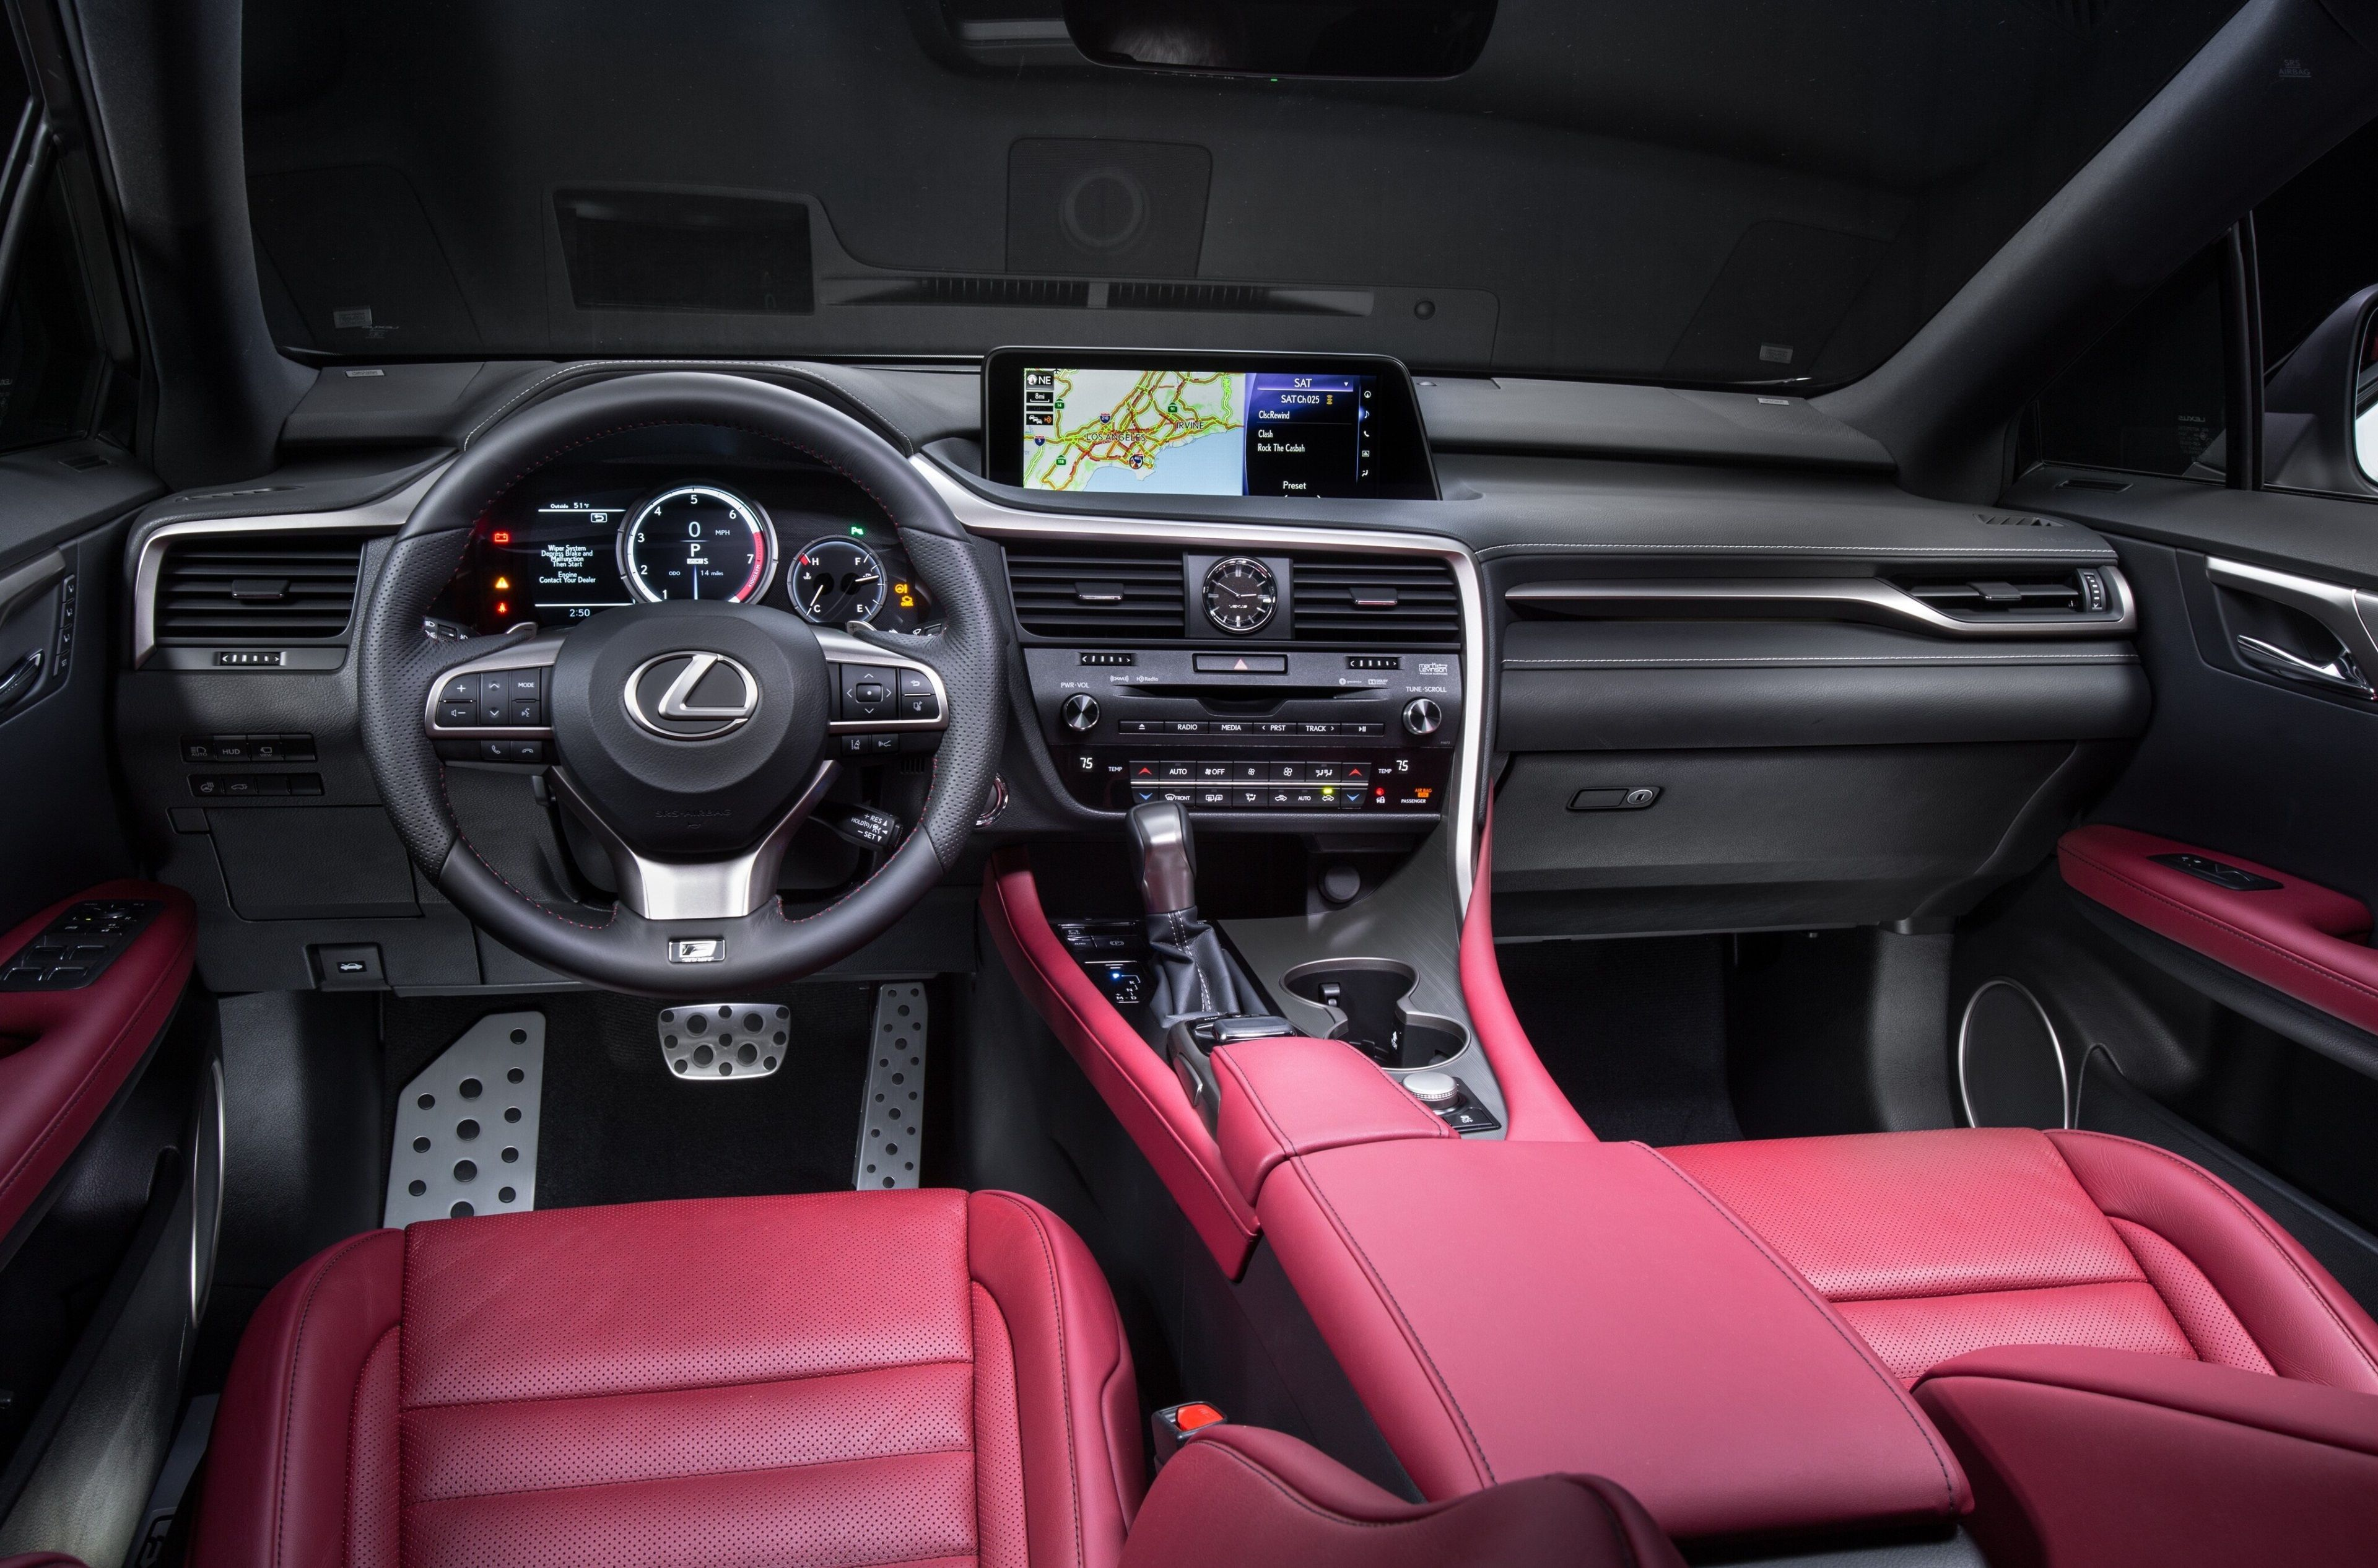 3840x2532 Lexus Rx 350 4k Hd Screen Wallpaper Lexus Rx 350 Lexus Rx 350 Interior Lexus